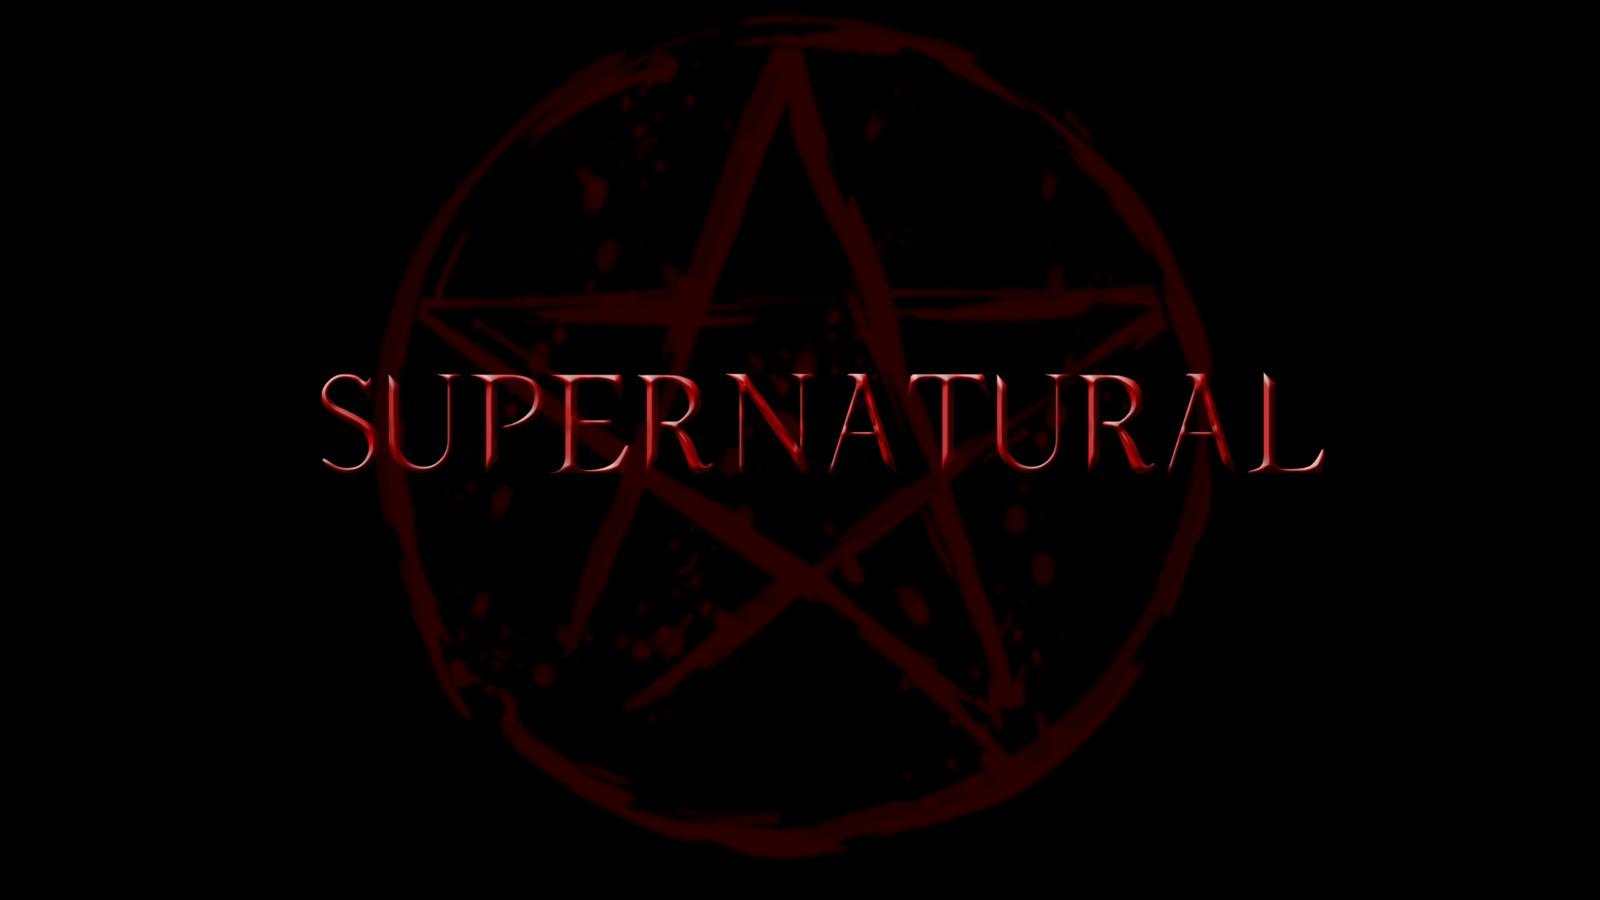 Supernatural Wallpaper 1600x900 Supernatural 1600x900